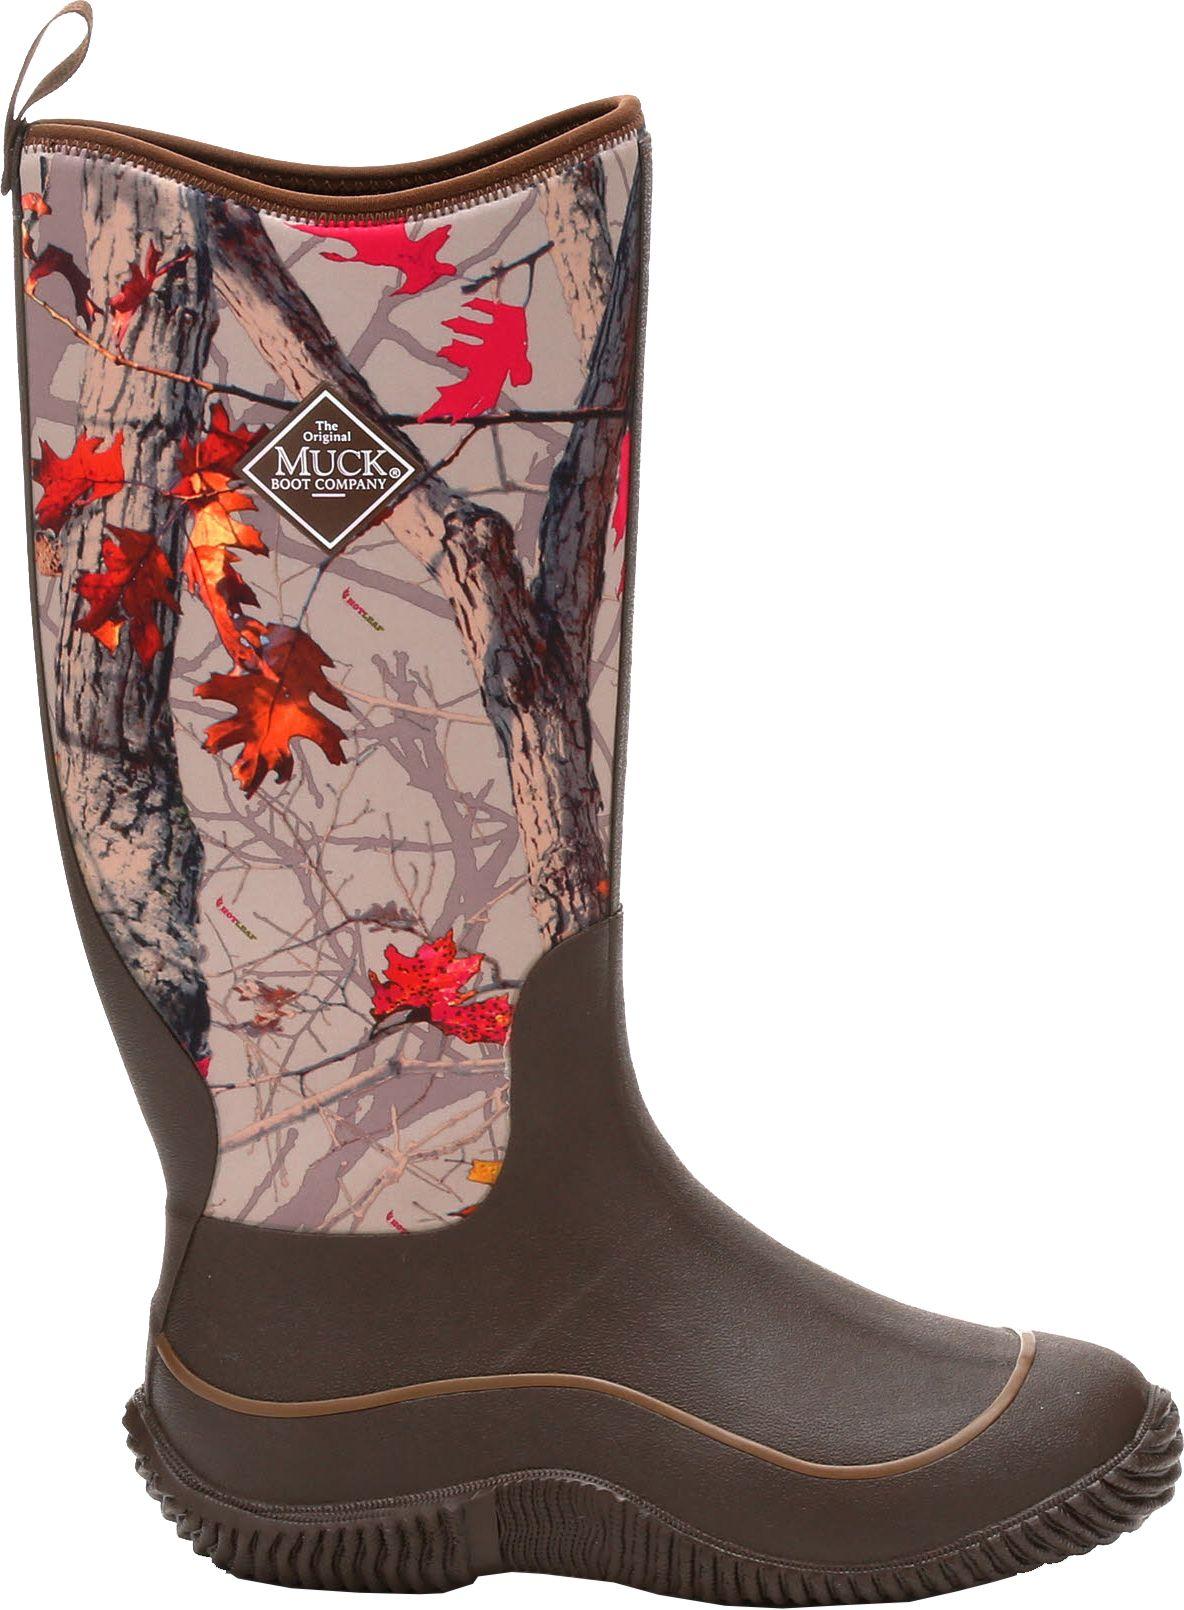 c65d527c0b6c Muck Boots Women s Hale Rubber Hunting Boots